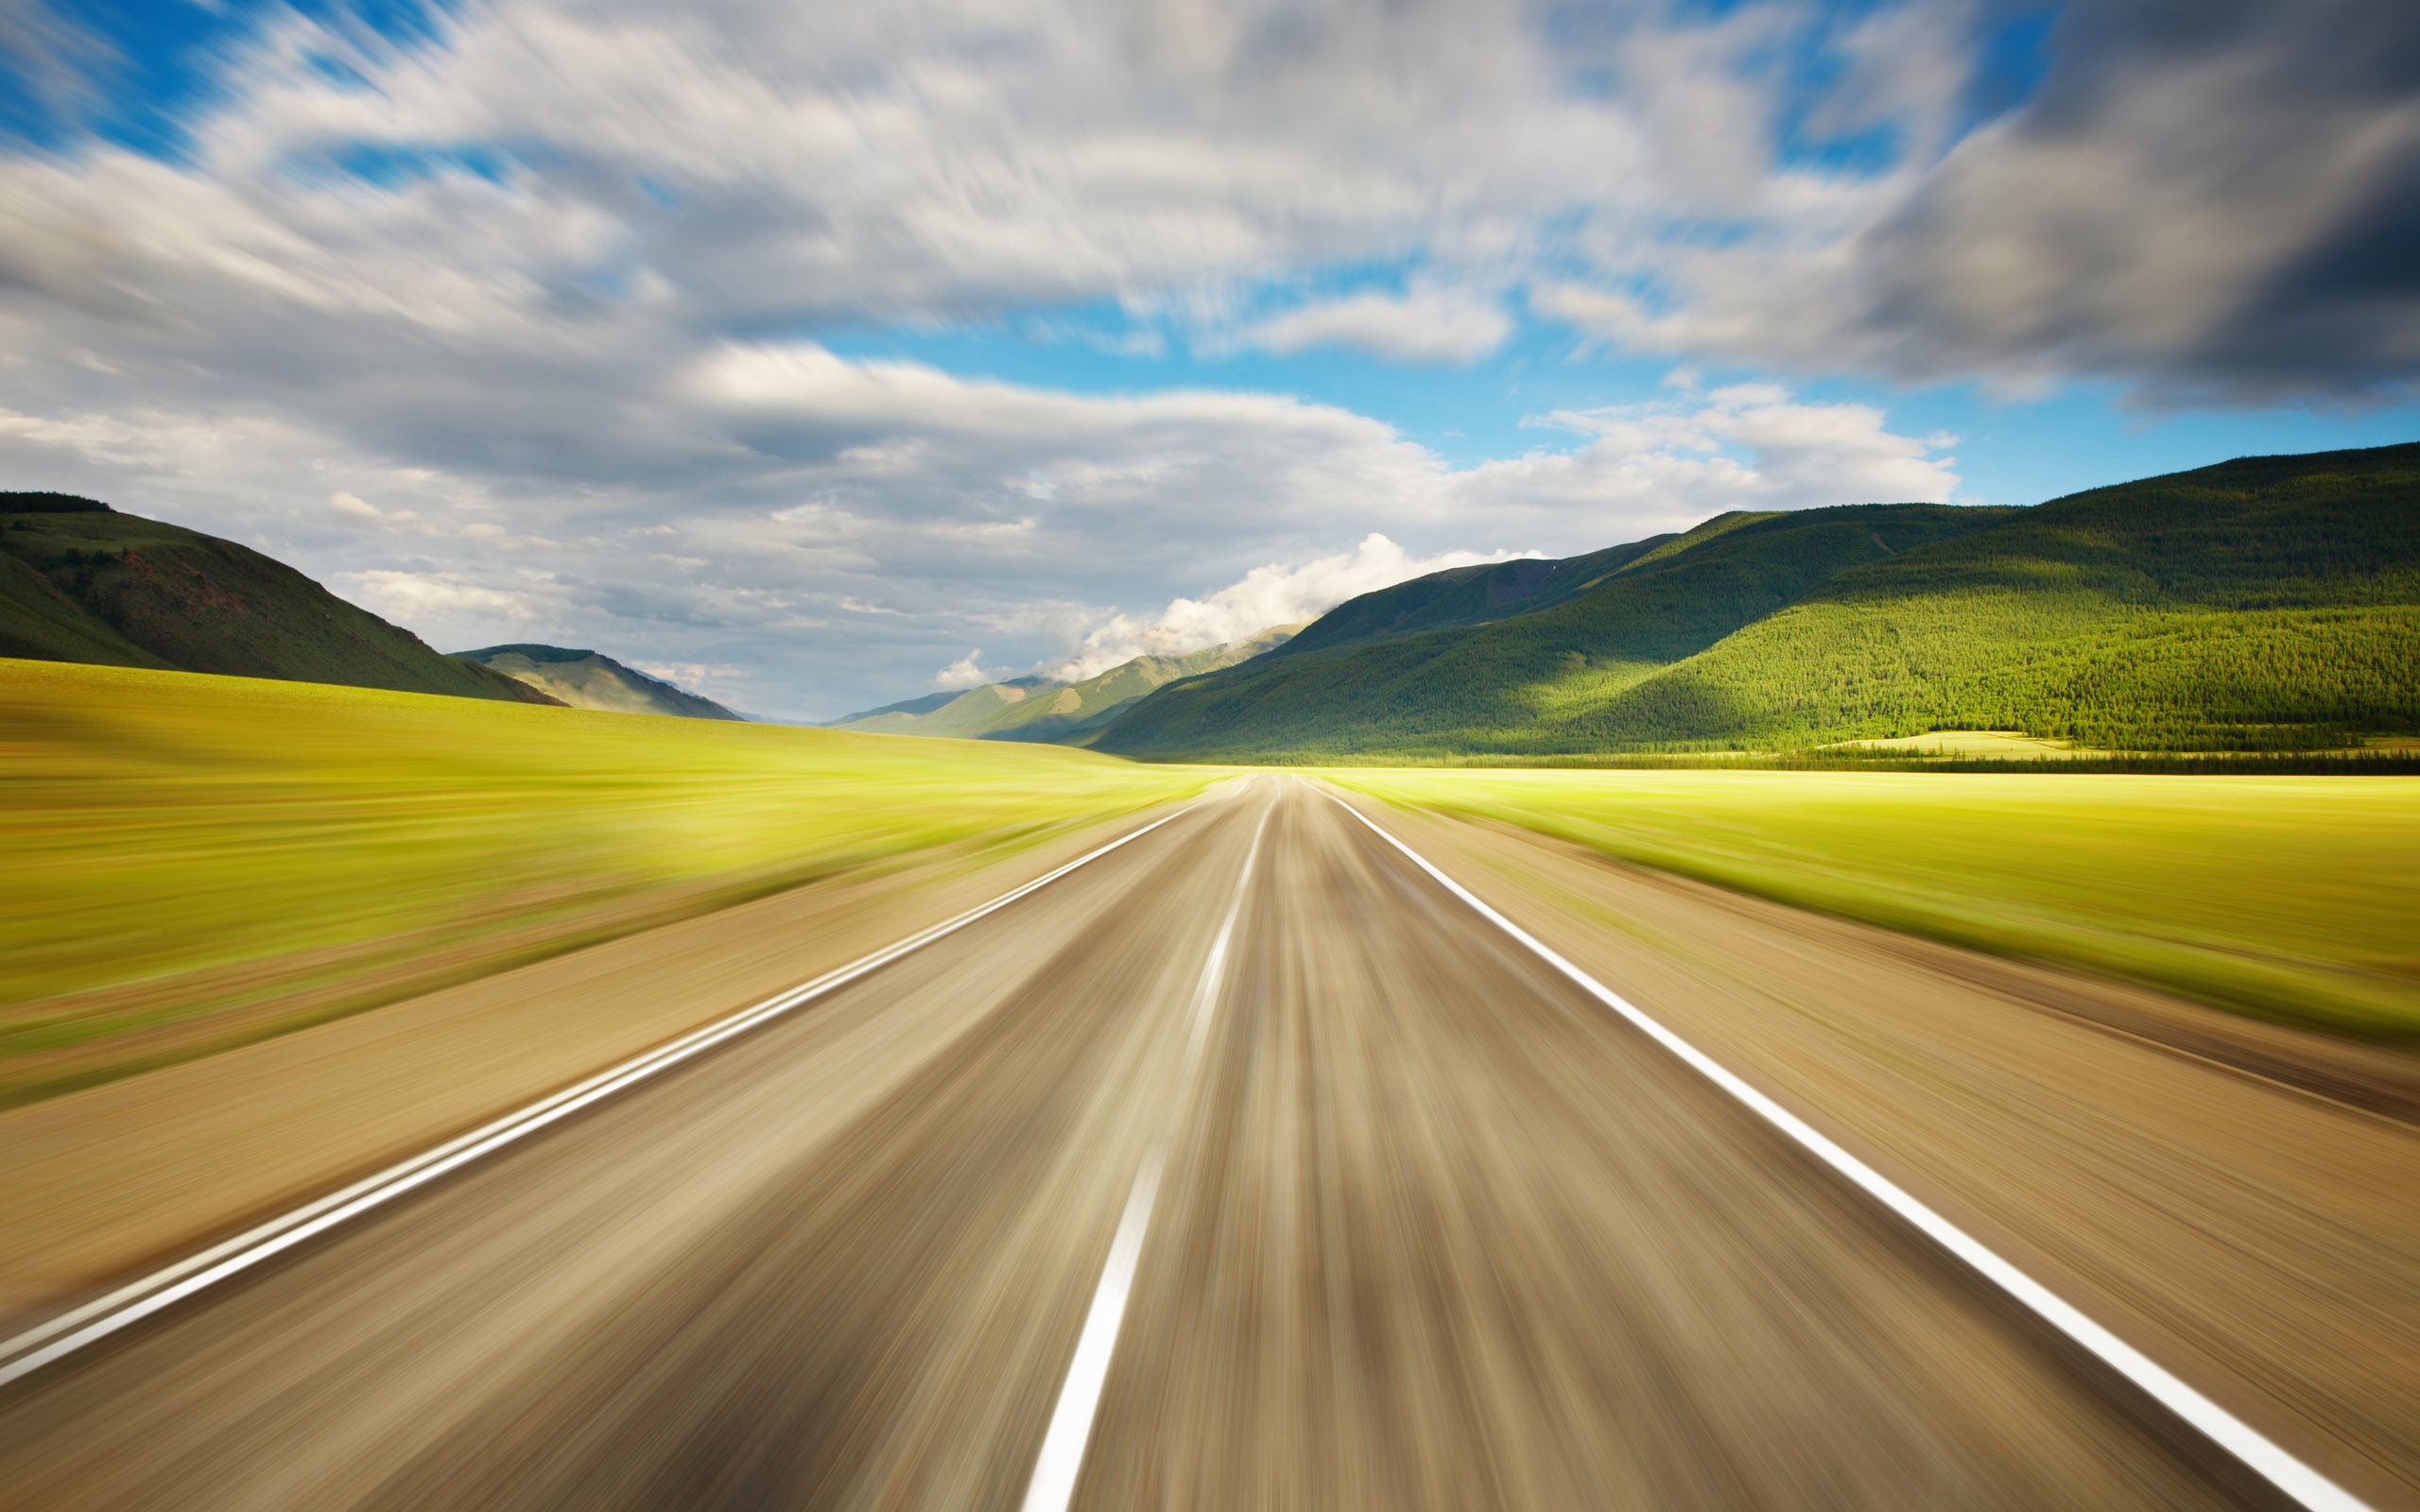 État de la route au Botswana - Motorokara.com